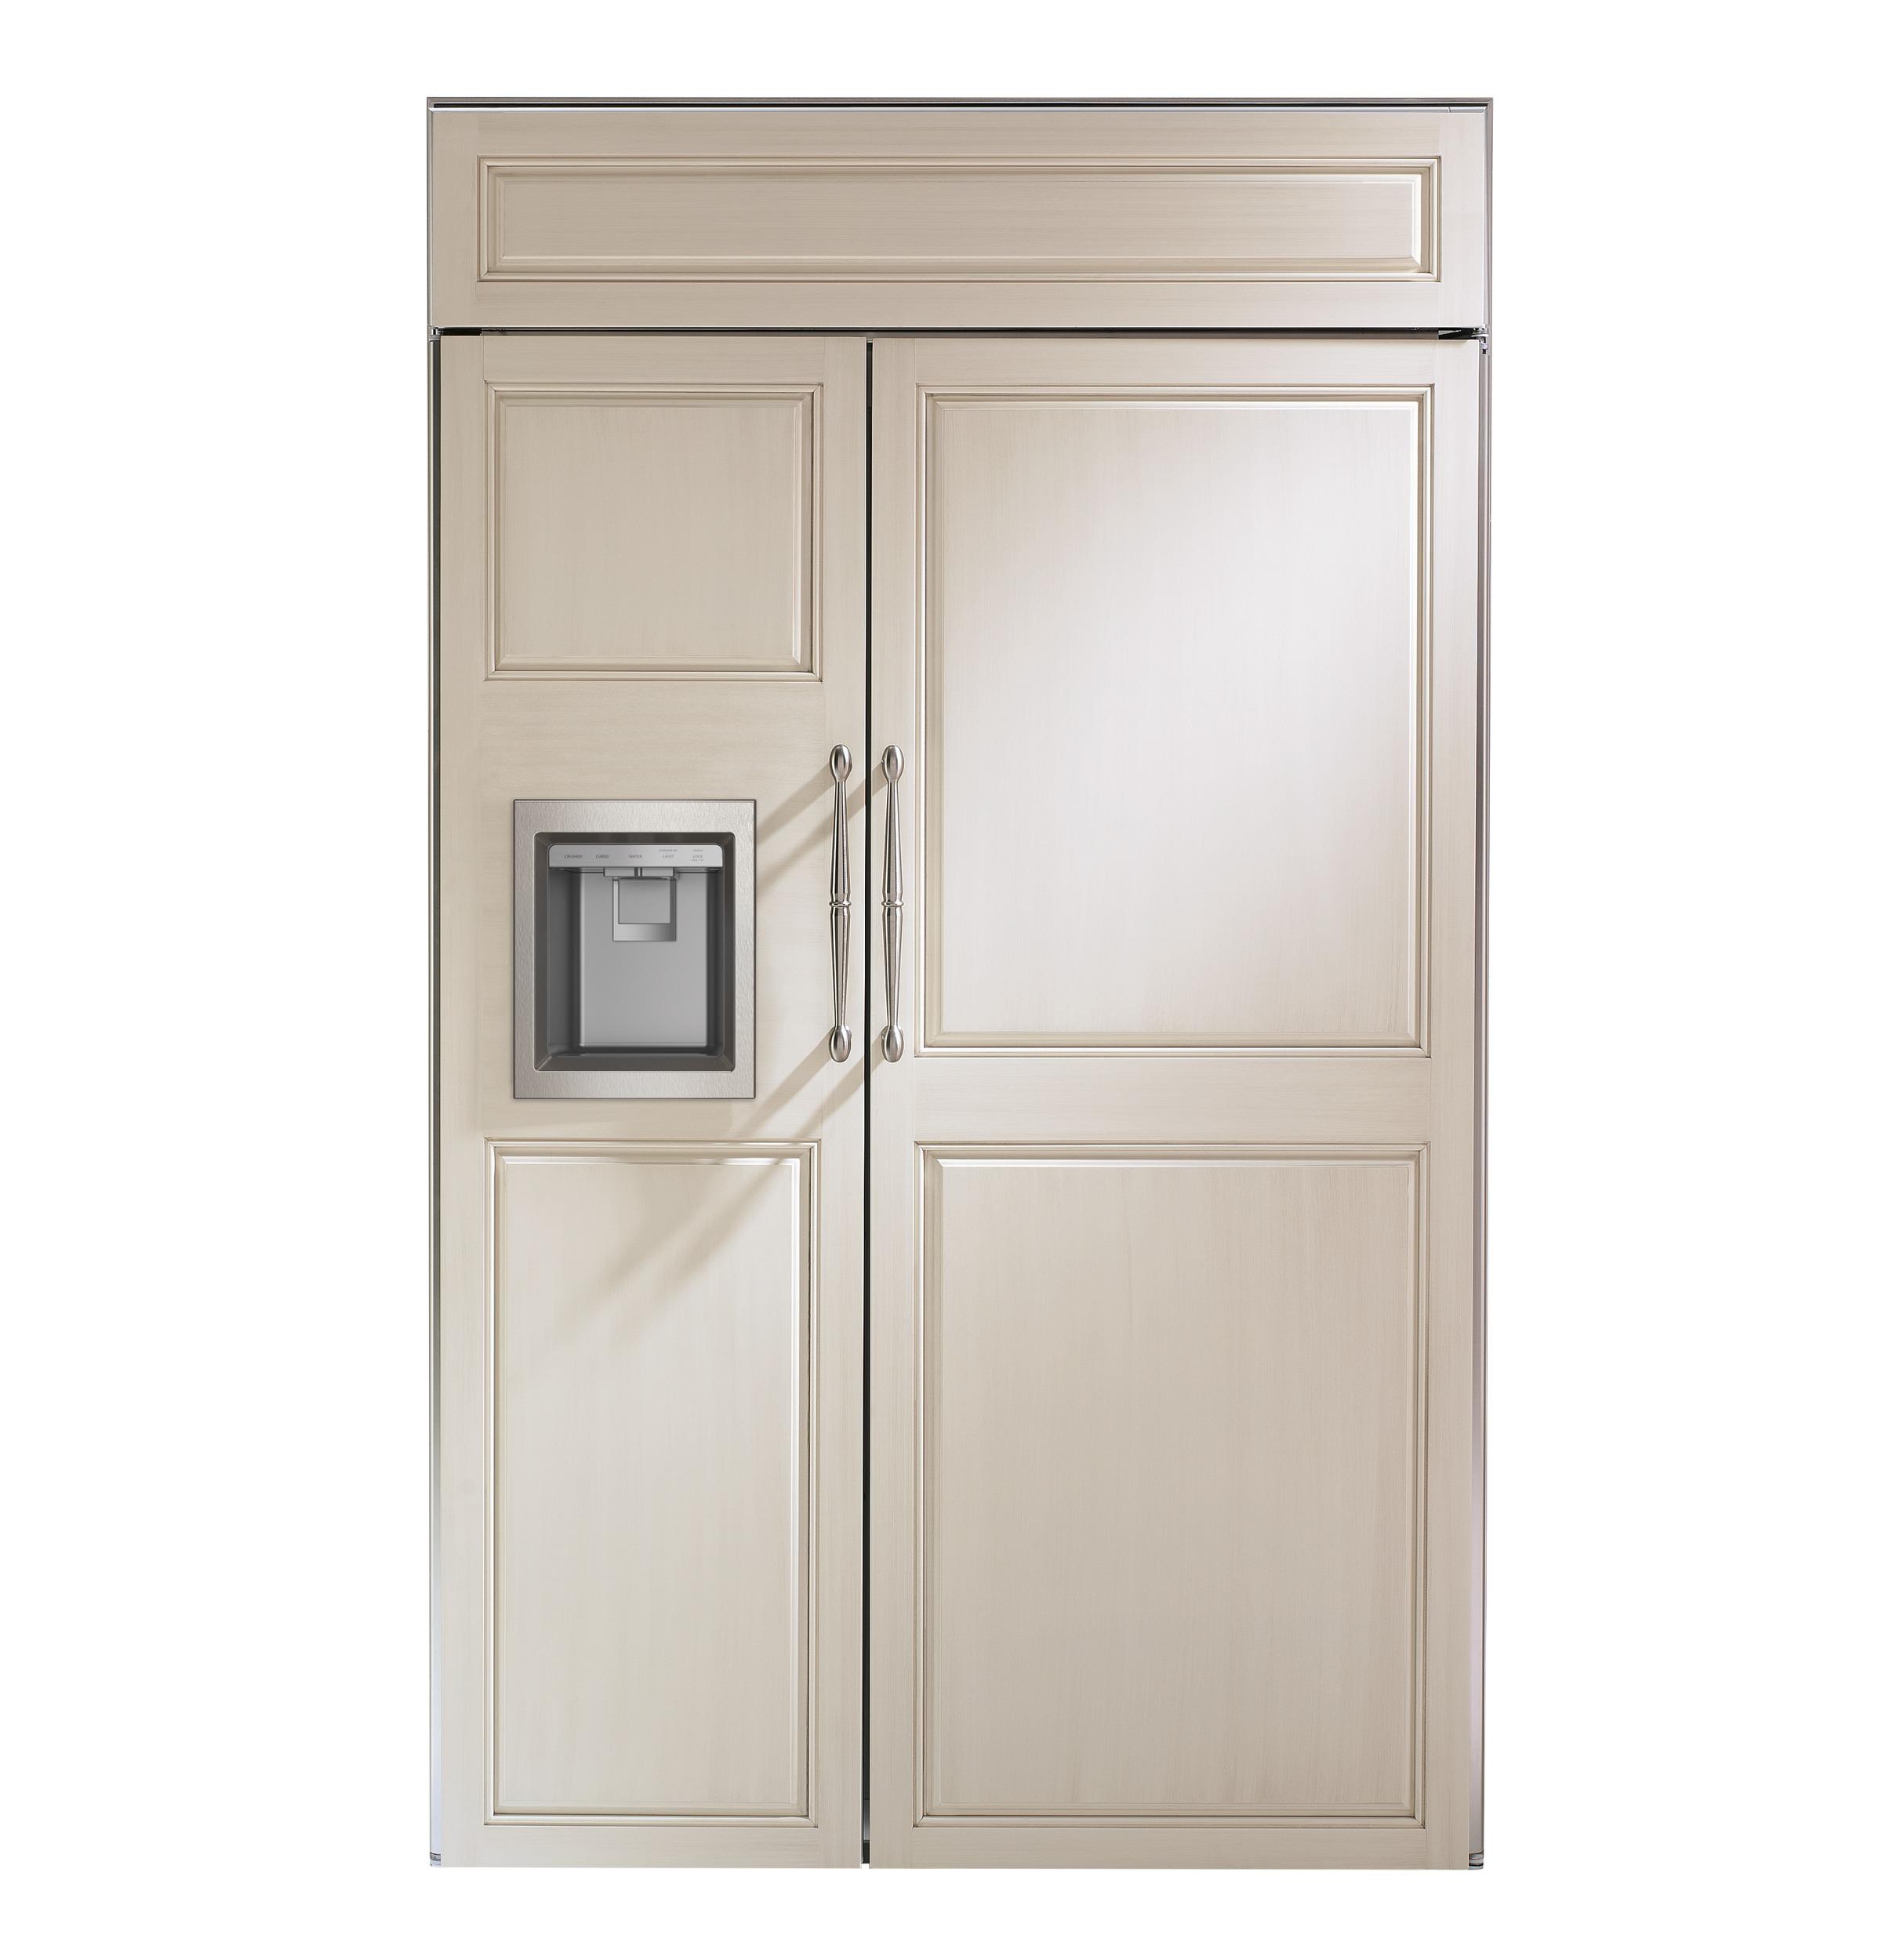 "Model: ZISB480DNII | Monogram Monogram 48"" Smart Built-In Side-by-Side Refrigerator with Dispenser"